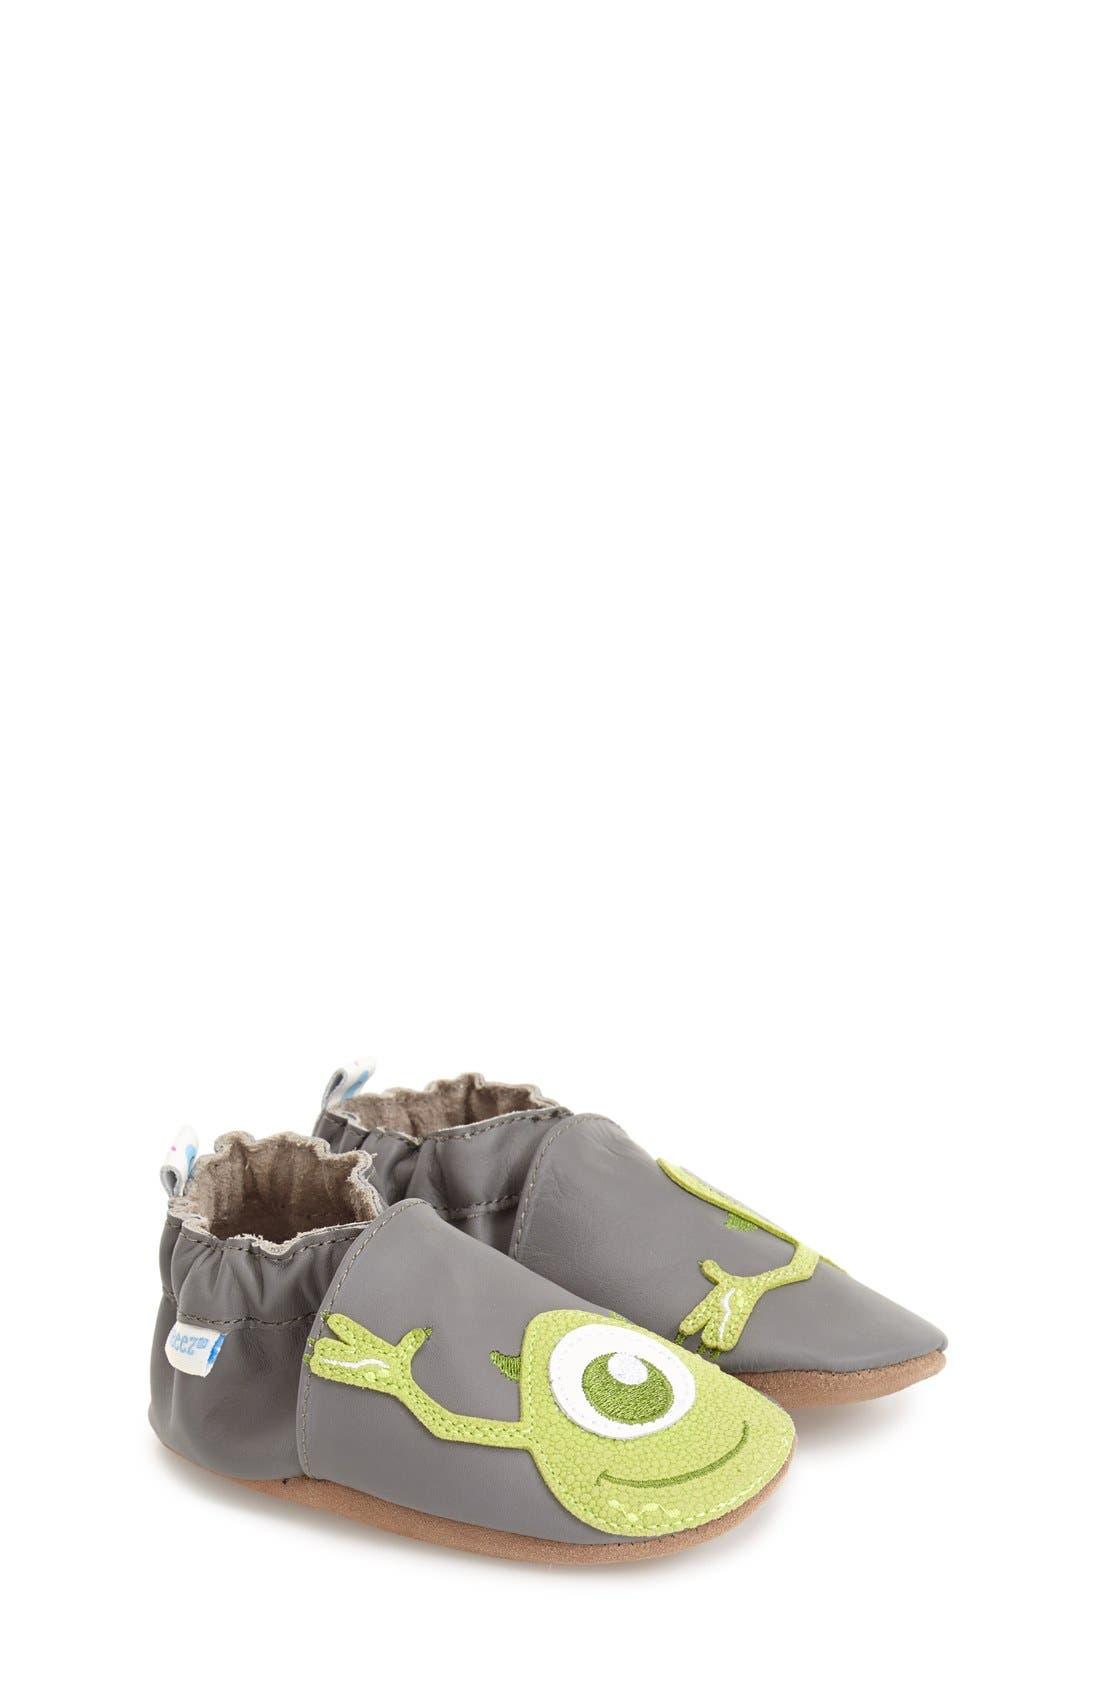 ROBEEZ® 'Disney® Monsters, Inc. ®' Slip-On Crib Shoe